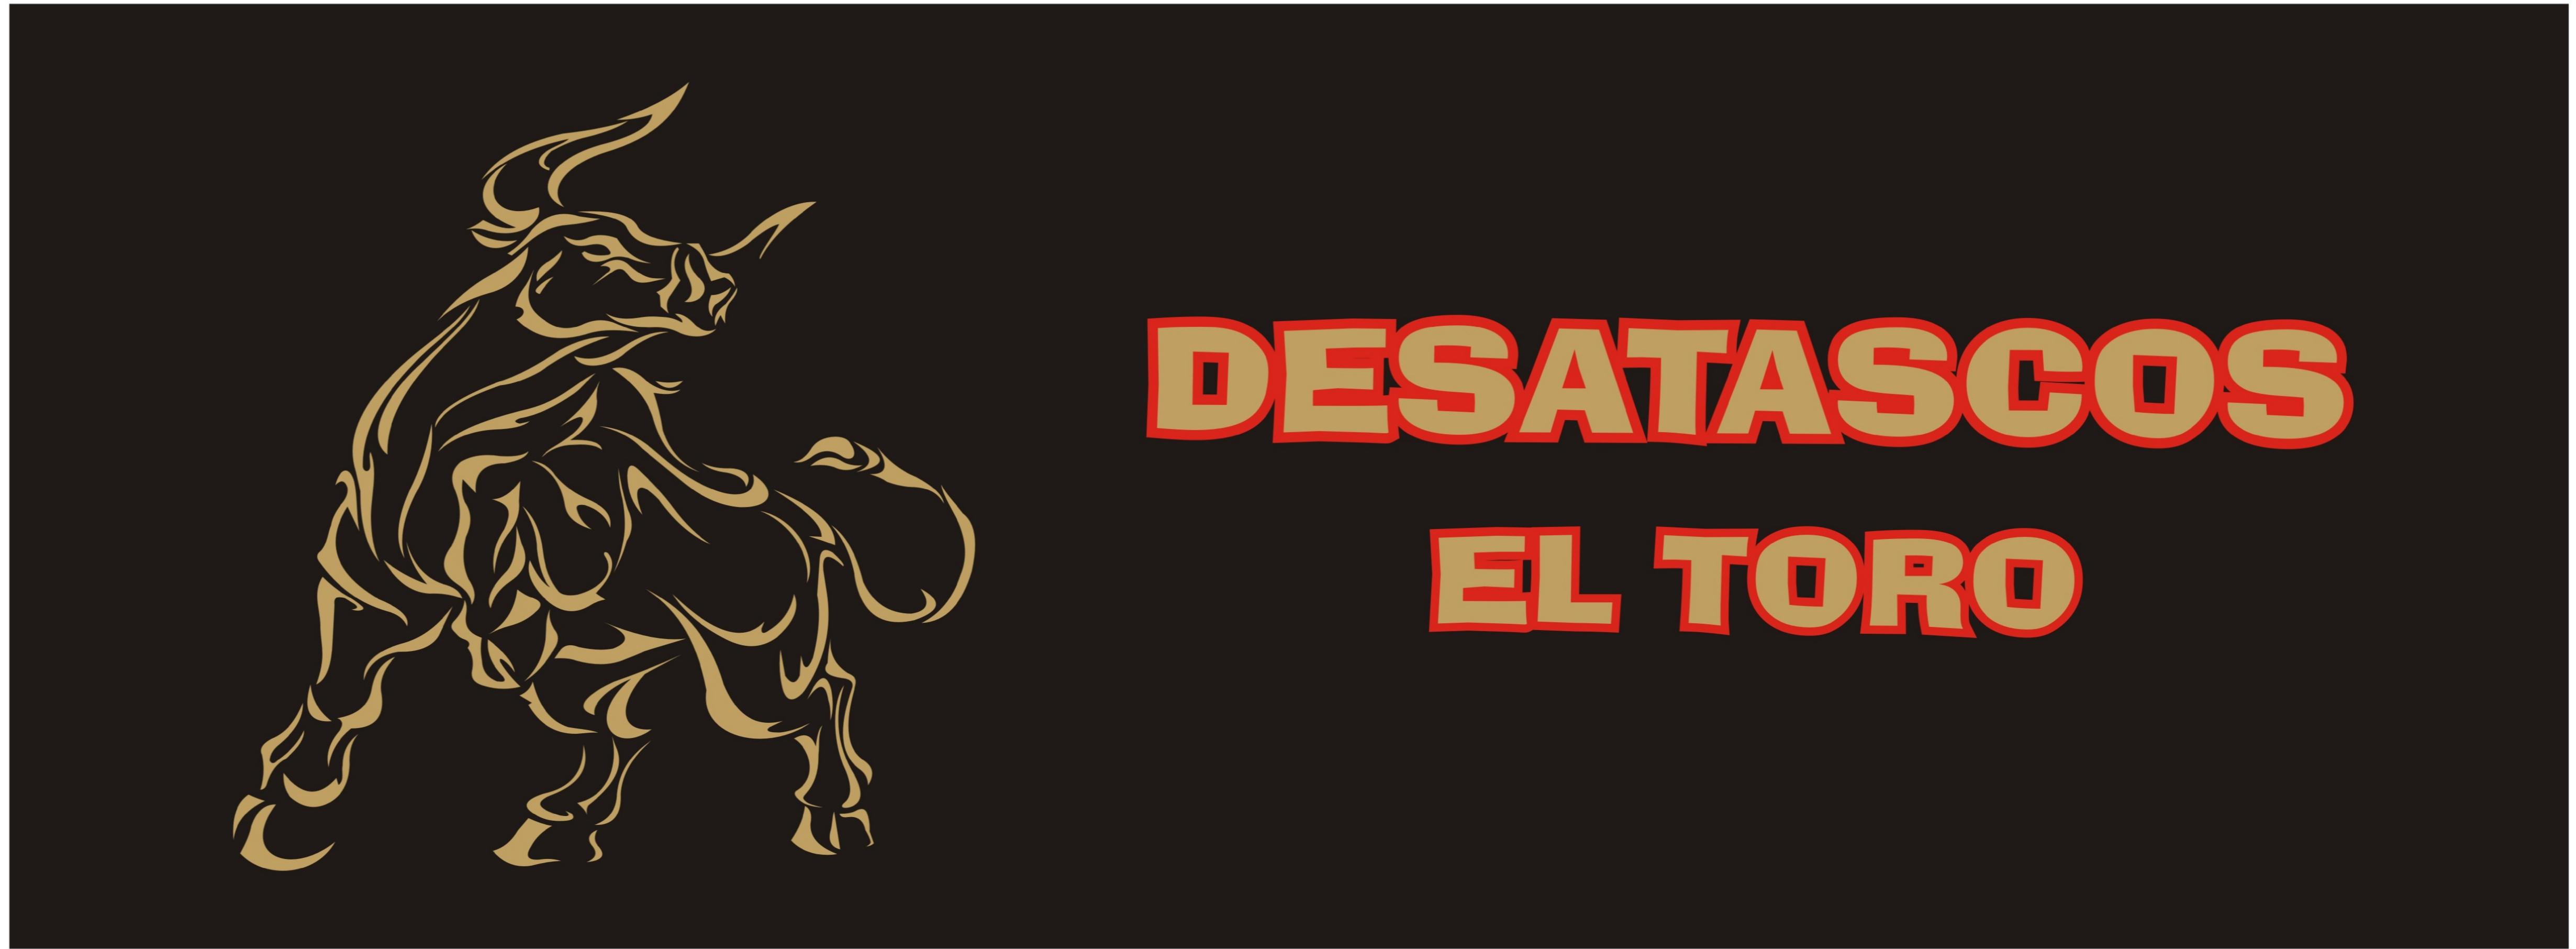 Desatascos El Toro